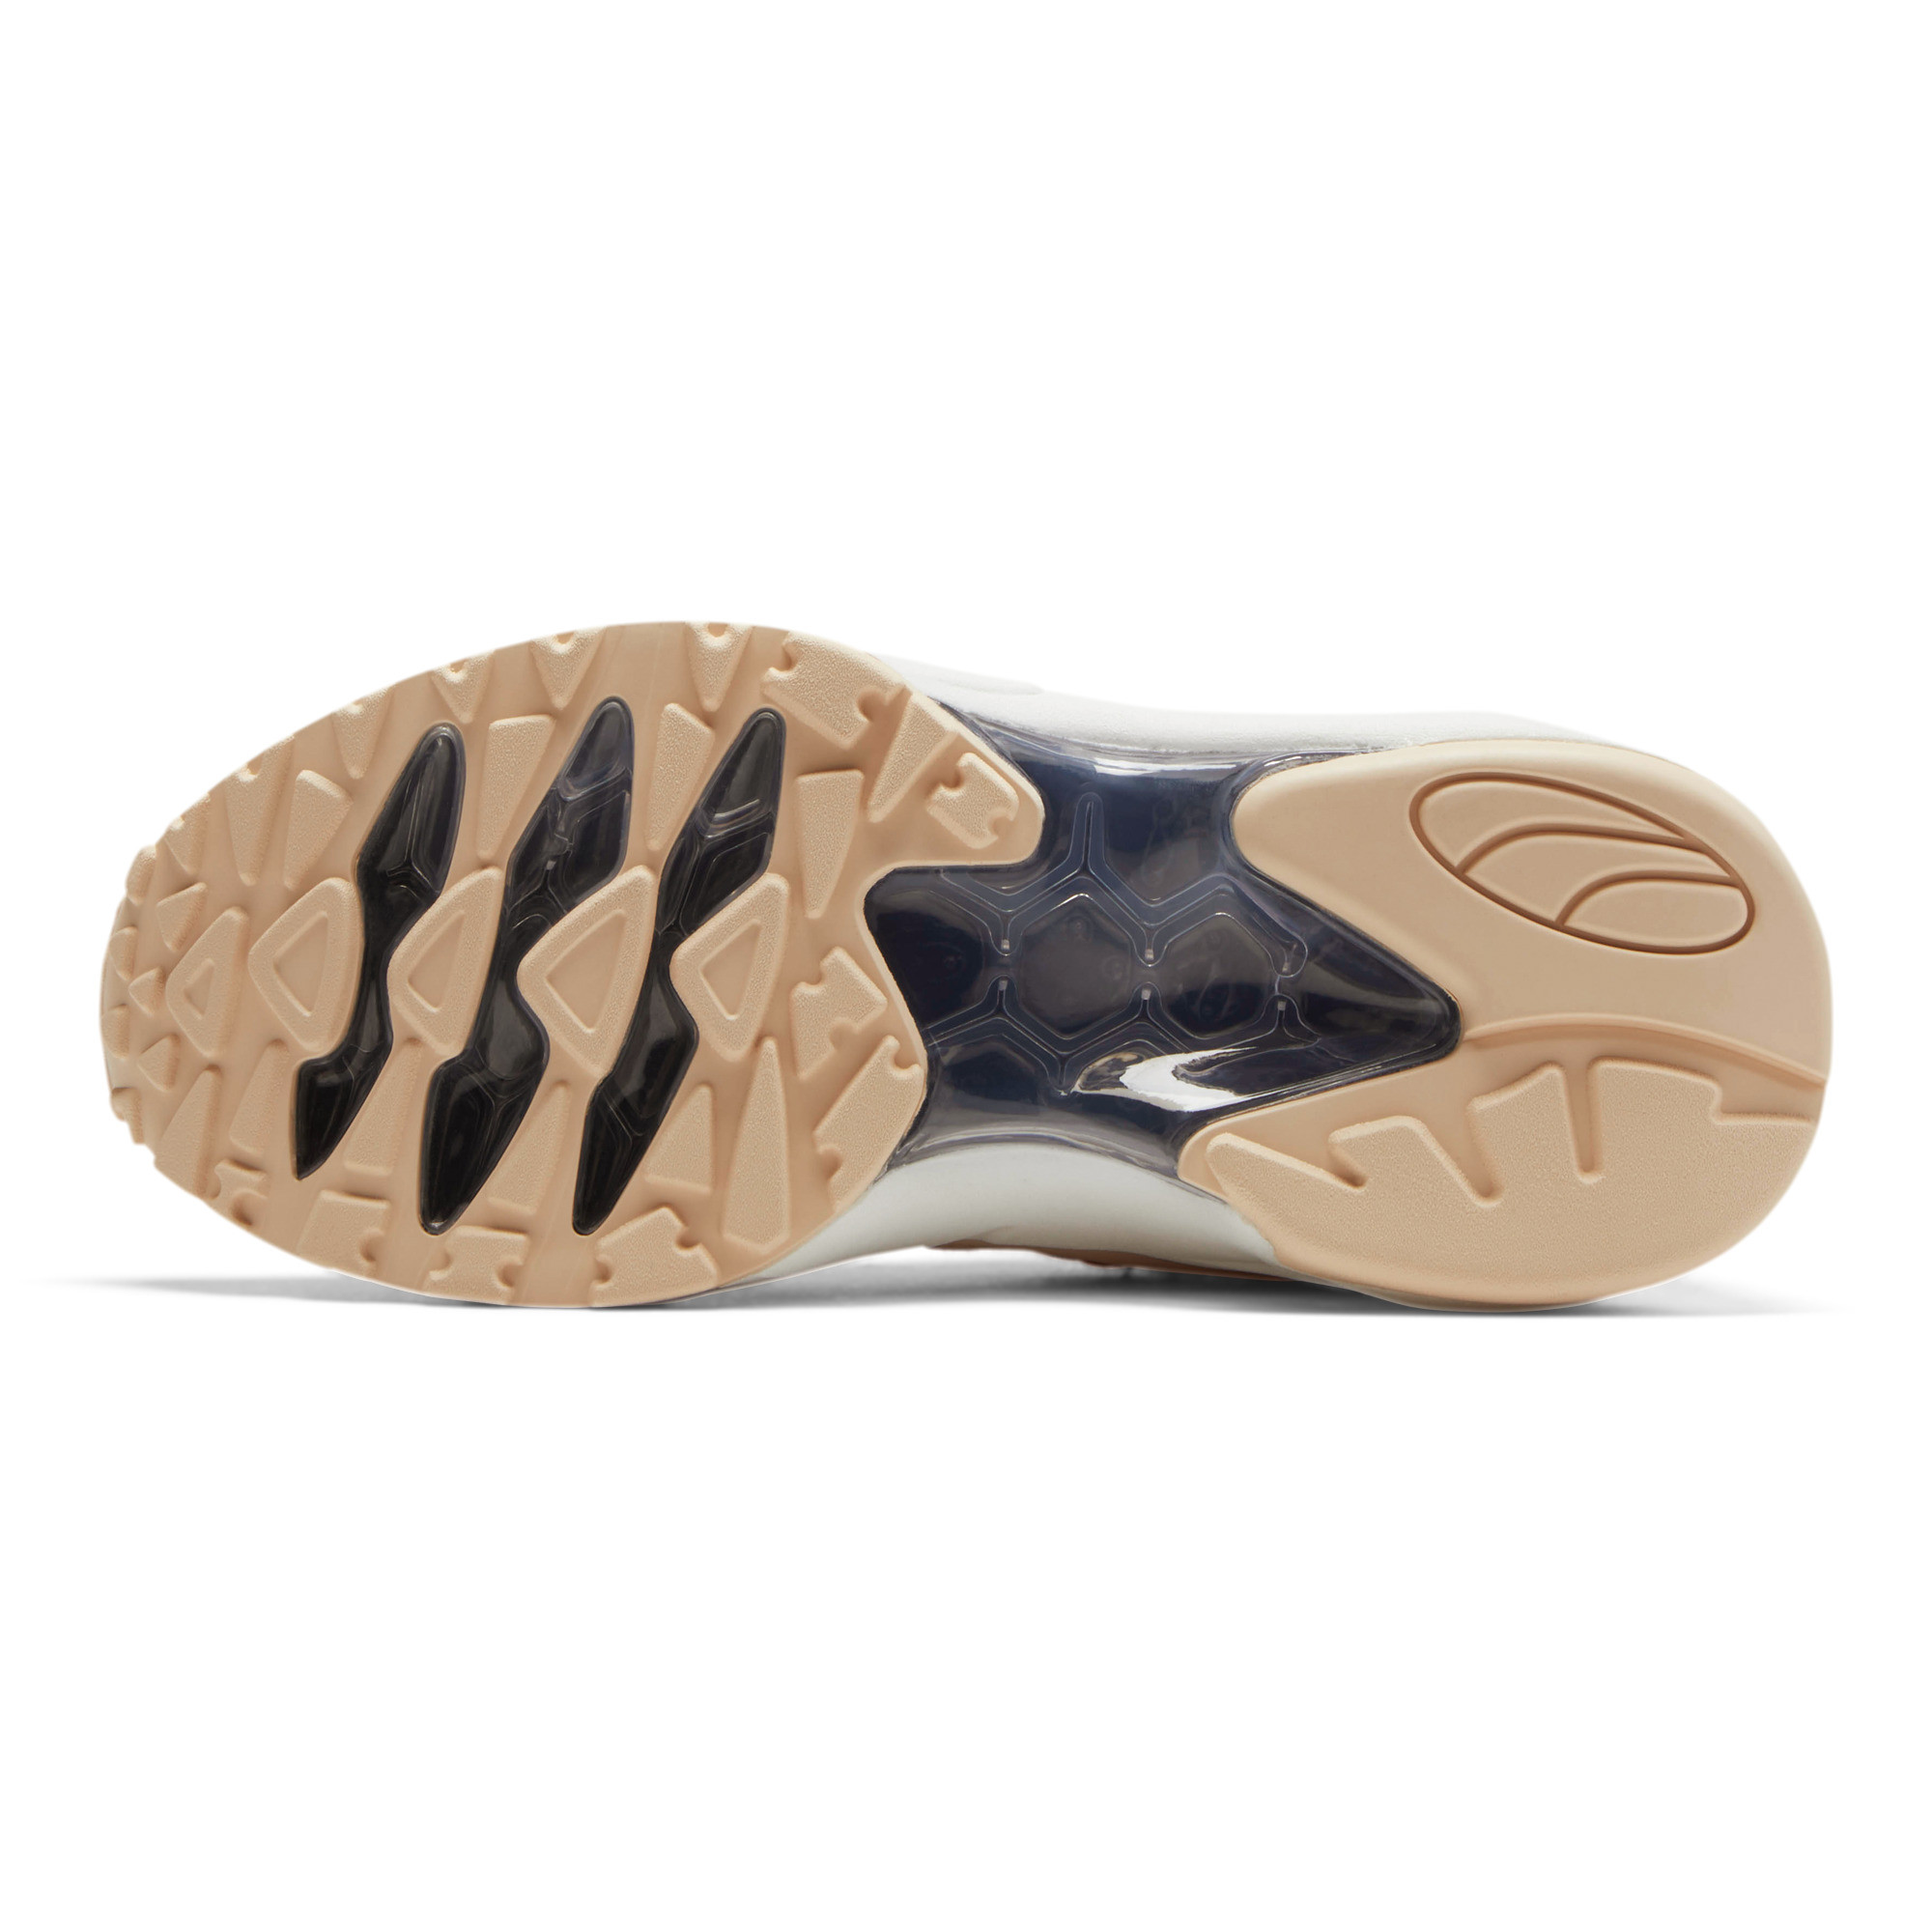 PUMA-CELL-Endura-Rebound-Women-039-s-Sneakers-Women-Shoe-Sport-Classics thumbnail 11